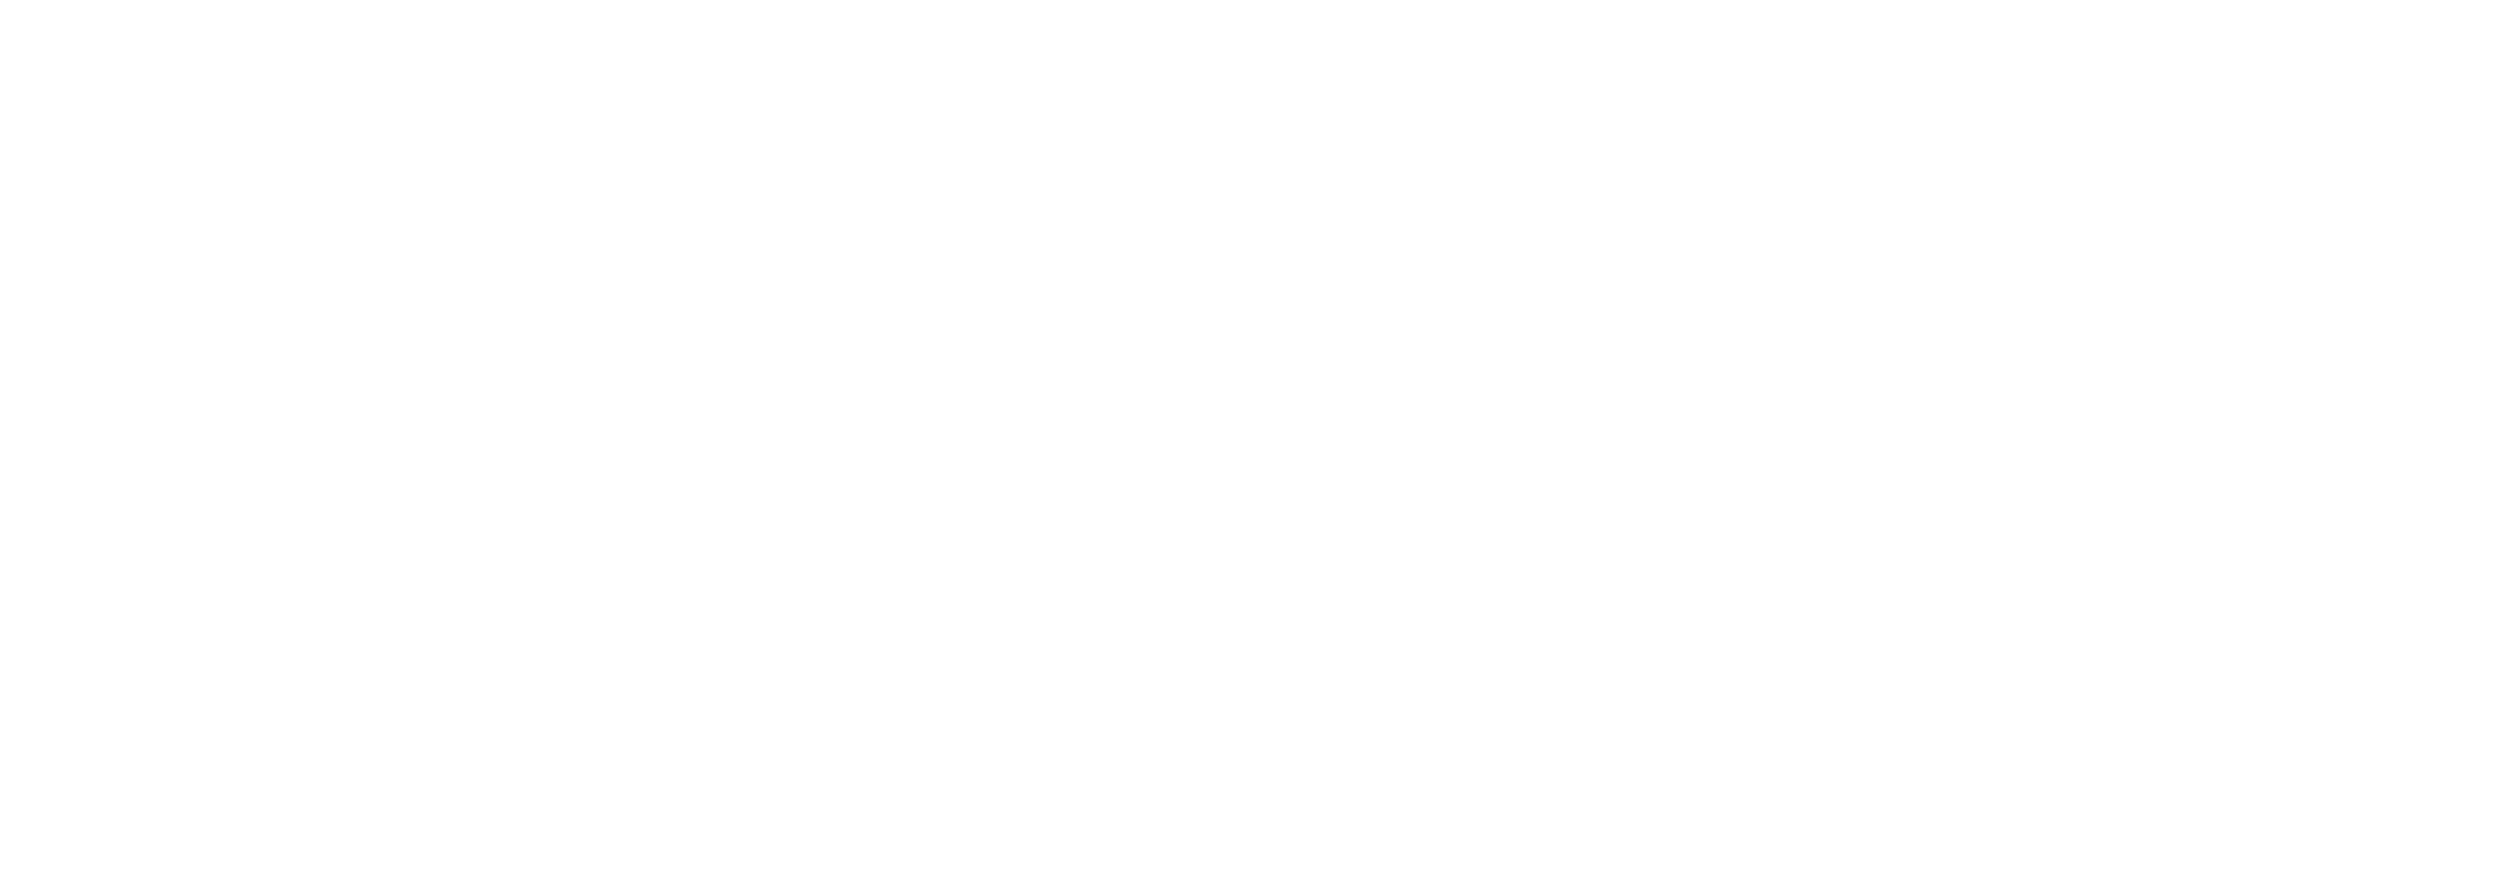 Illustation Zug